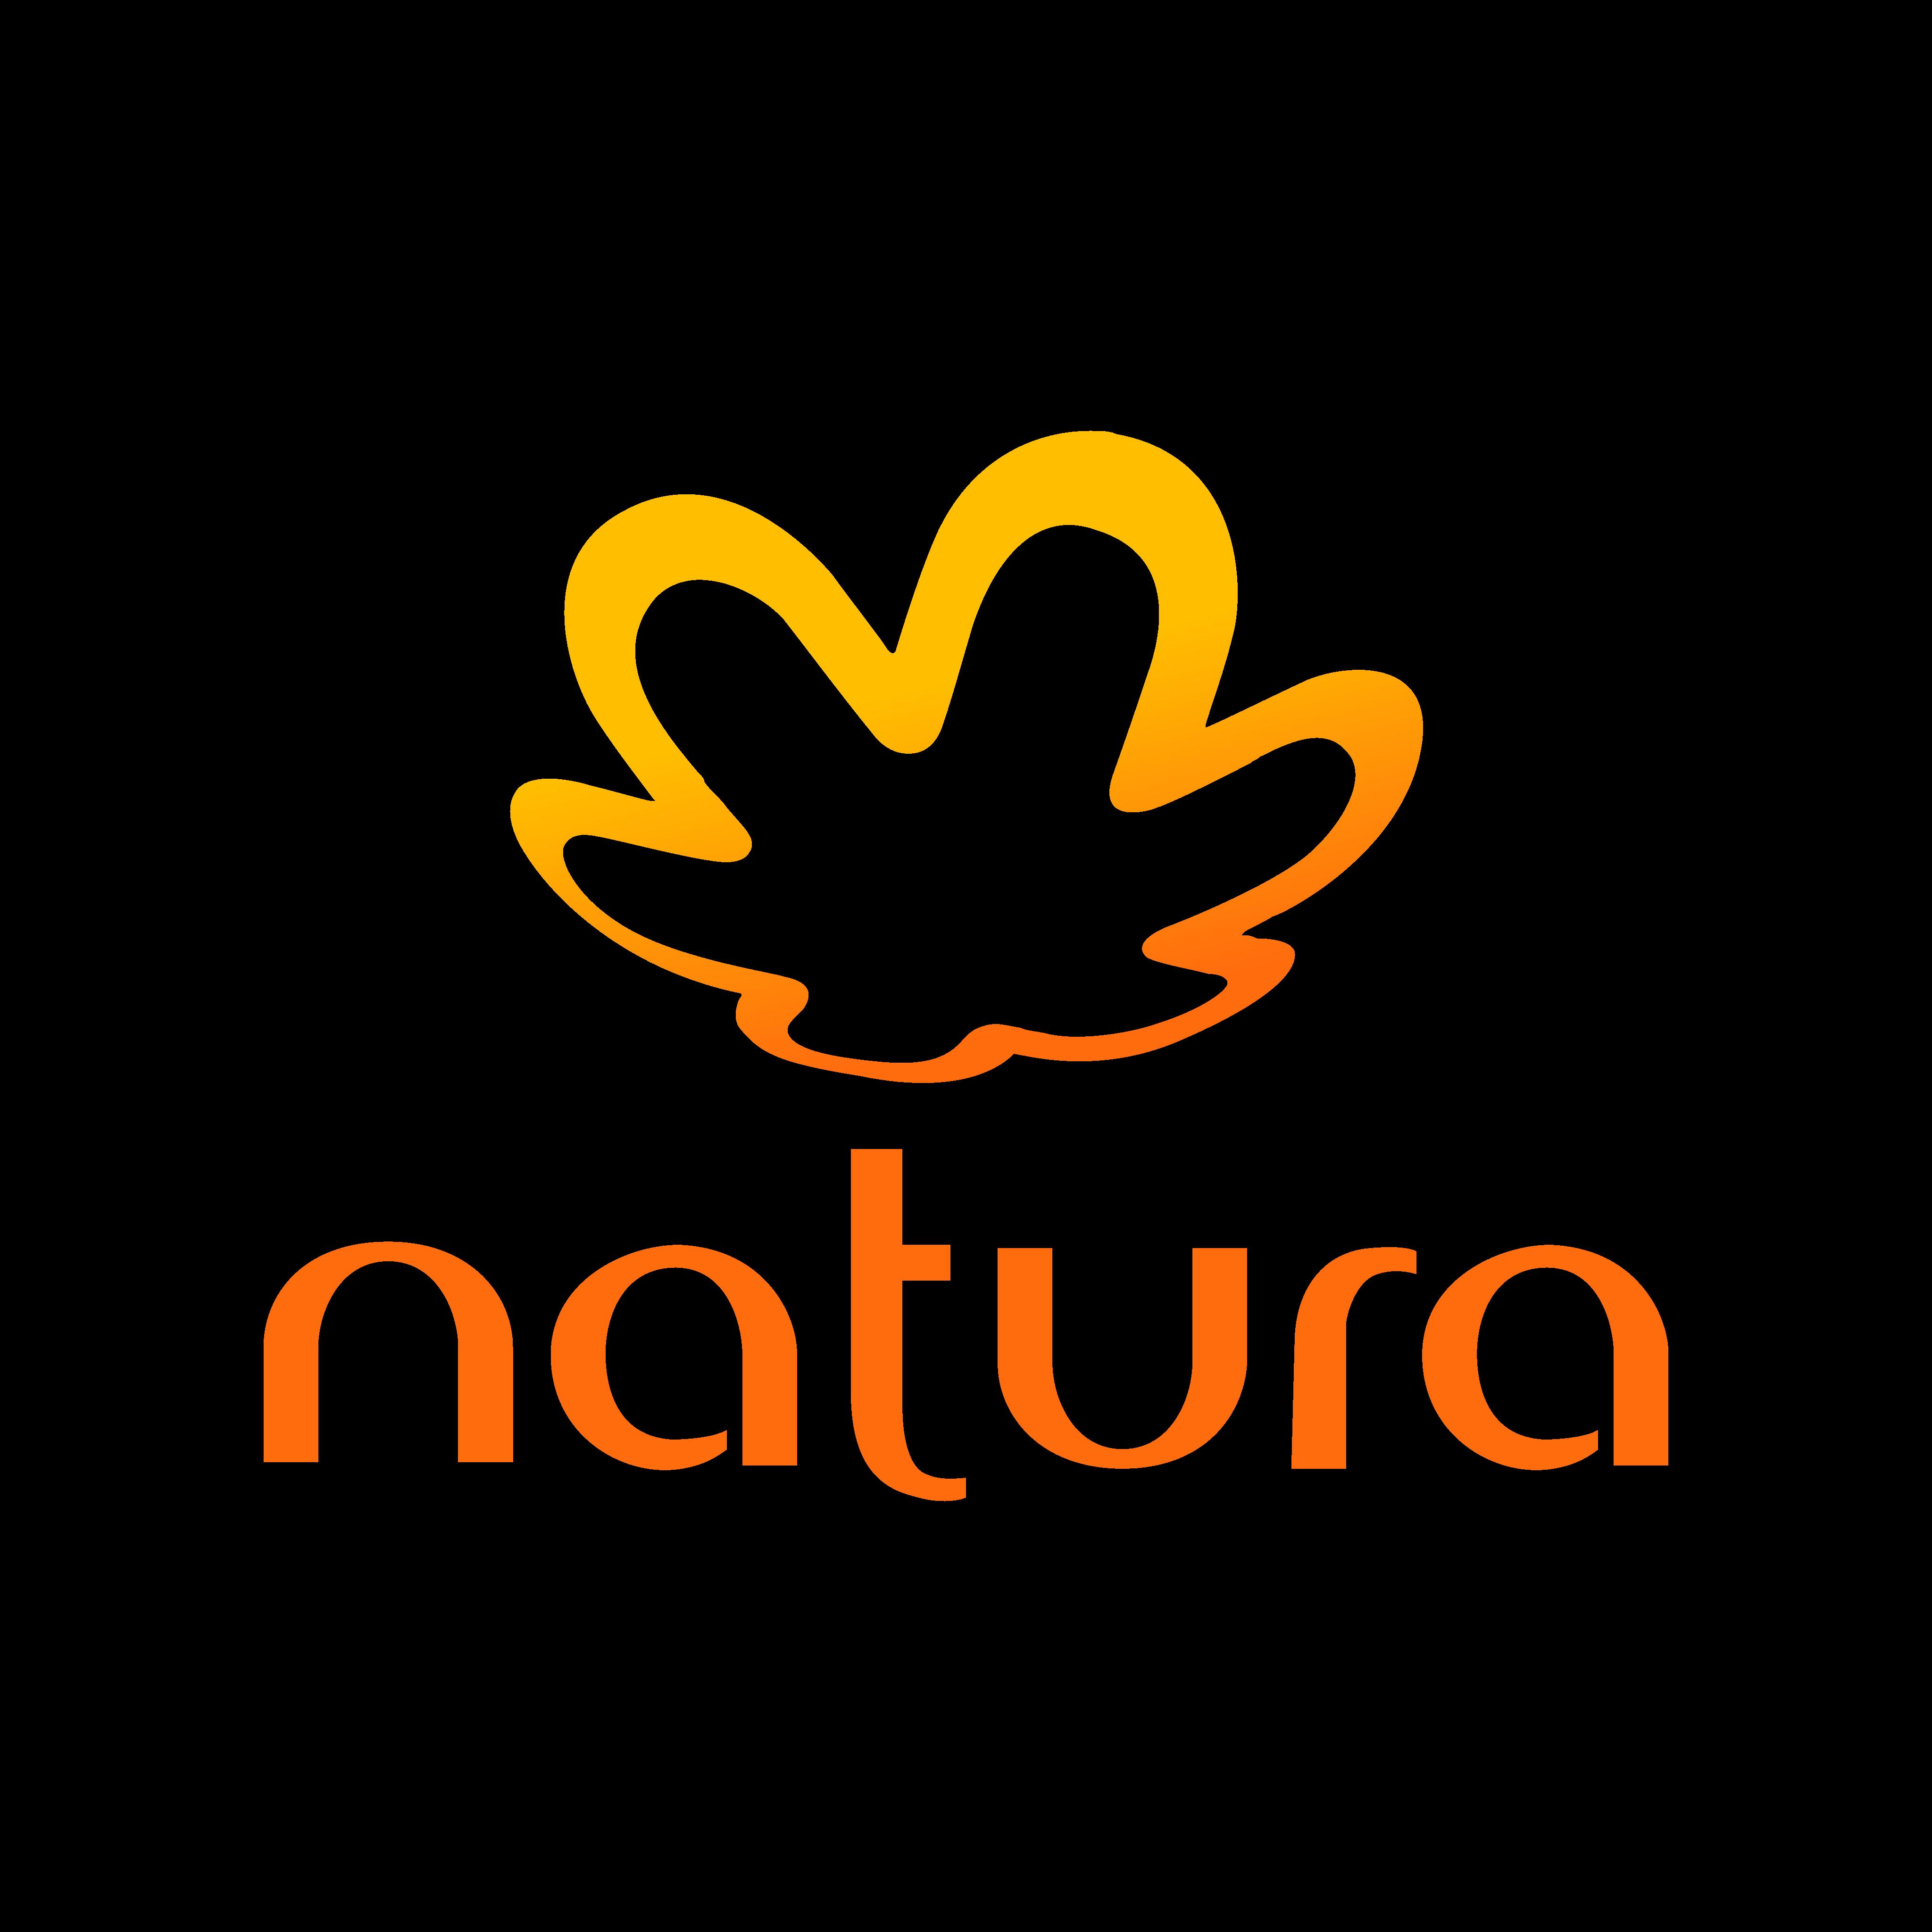 natura logo 0 - Natura Logo